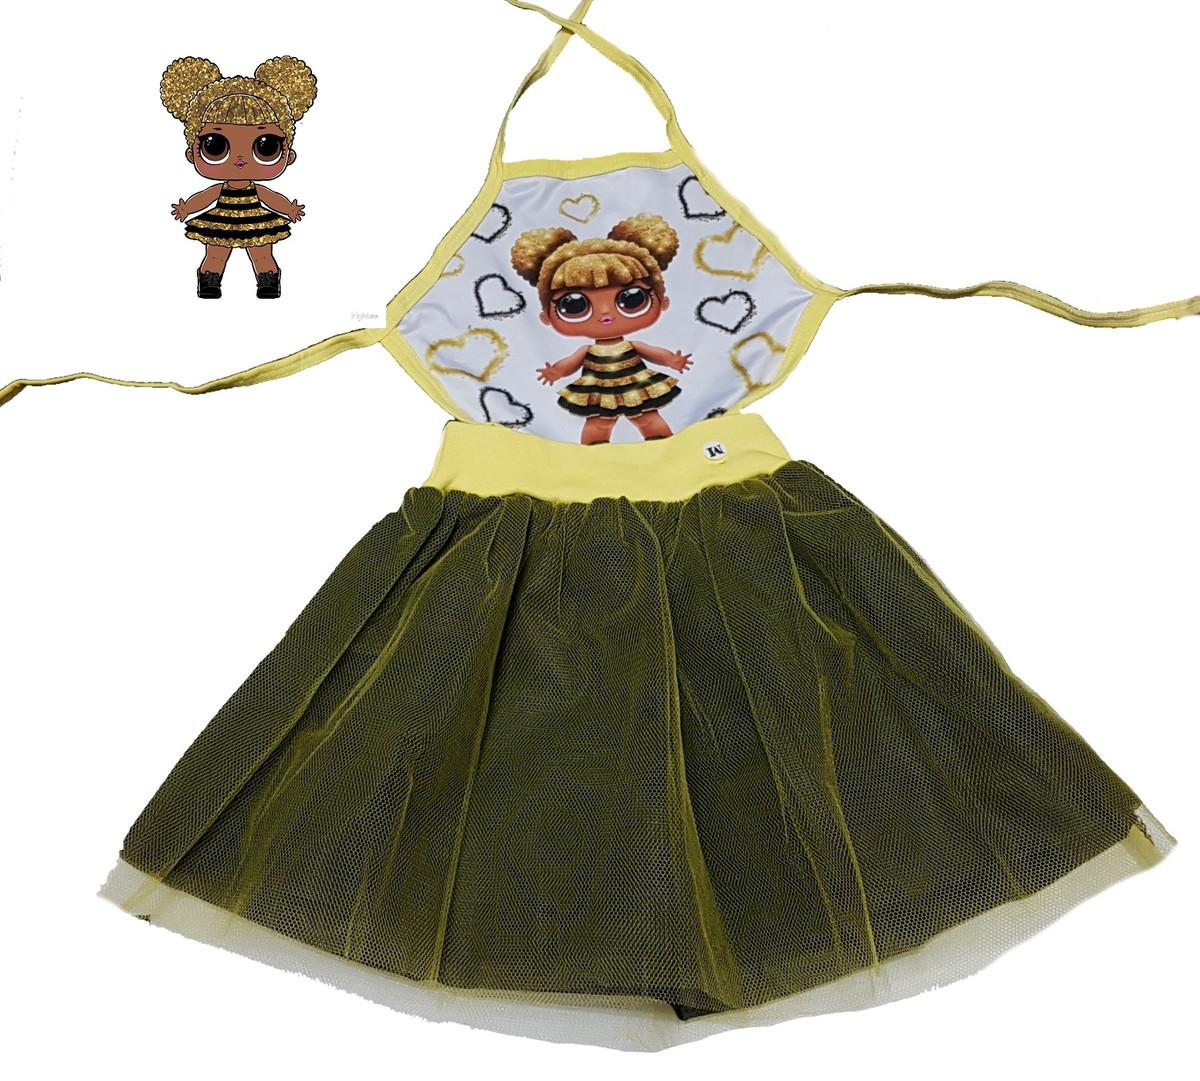 Fantasia Lol Queen Bee Carnaval Vestido No Elo7 Borboletinhas Kids E382d4